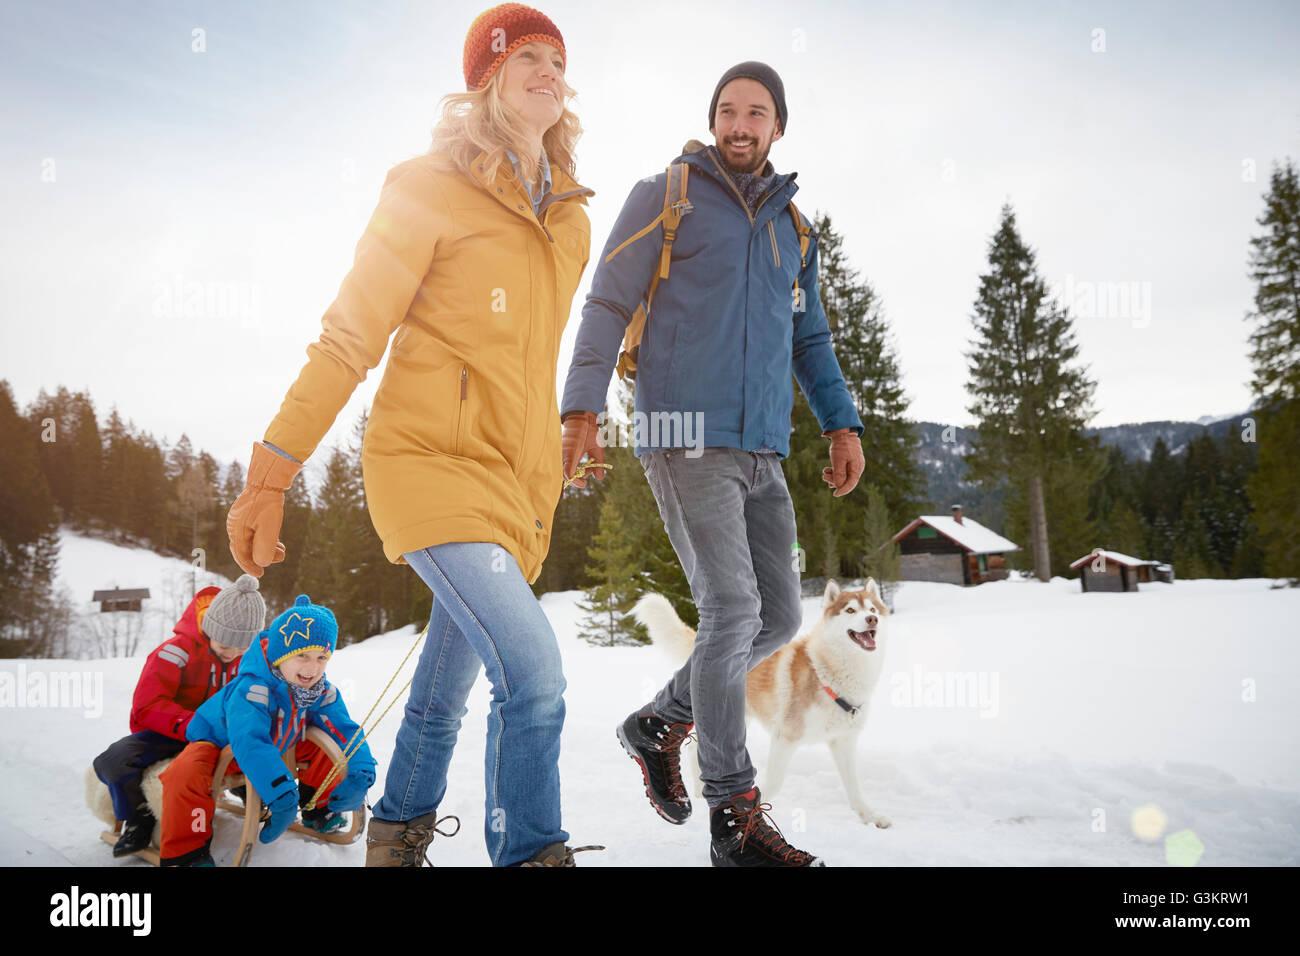 Parents pulling sons on toboggan in winter landscape, Elmau, Bavaria, Germany - Stock Image